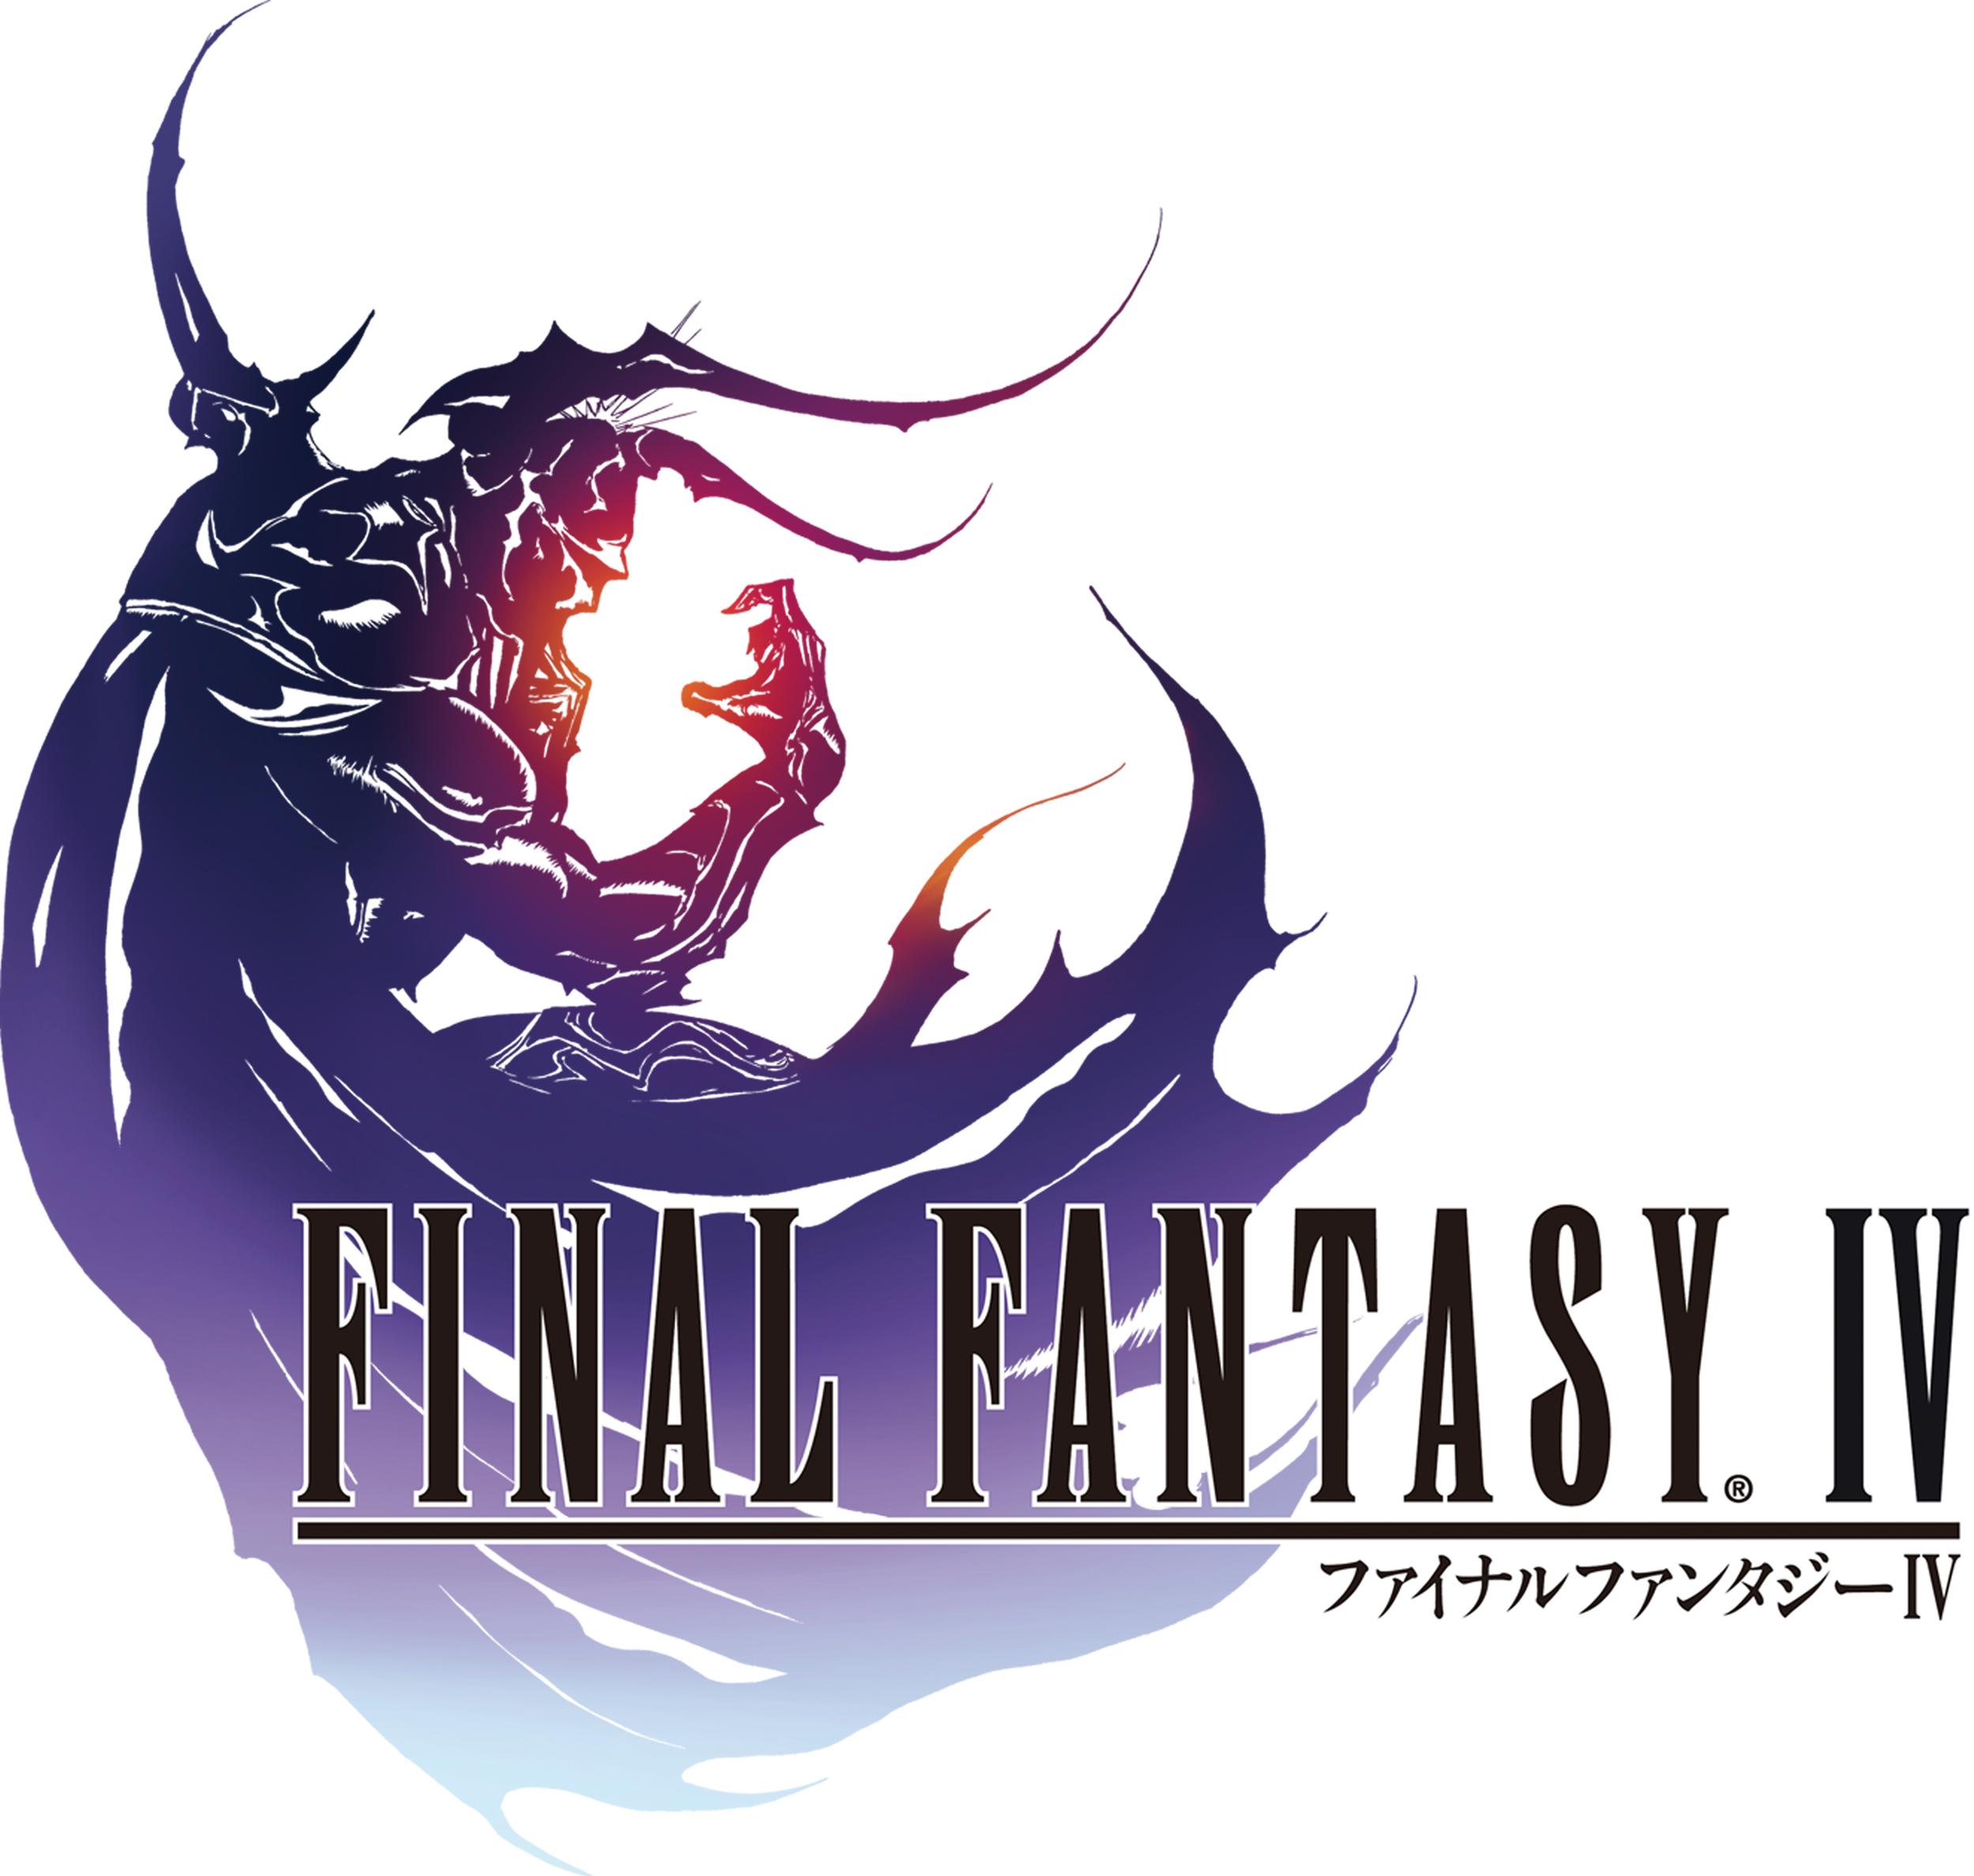 Final Fantasy IV FFIVnds_logo